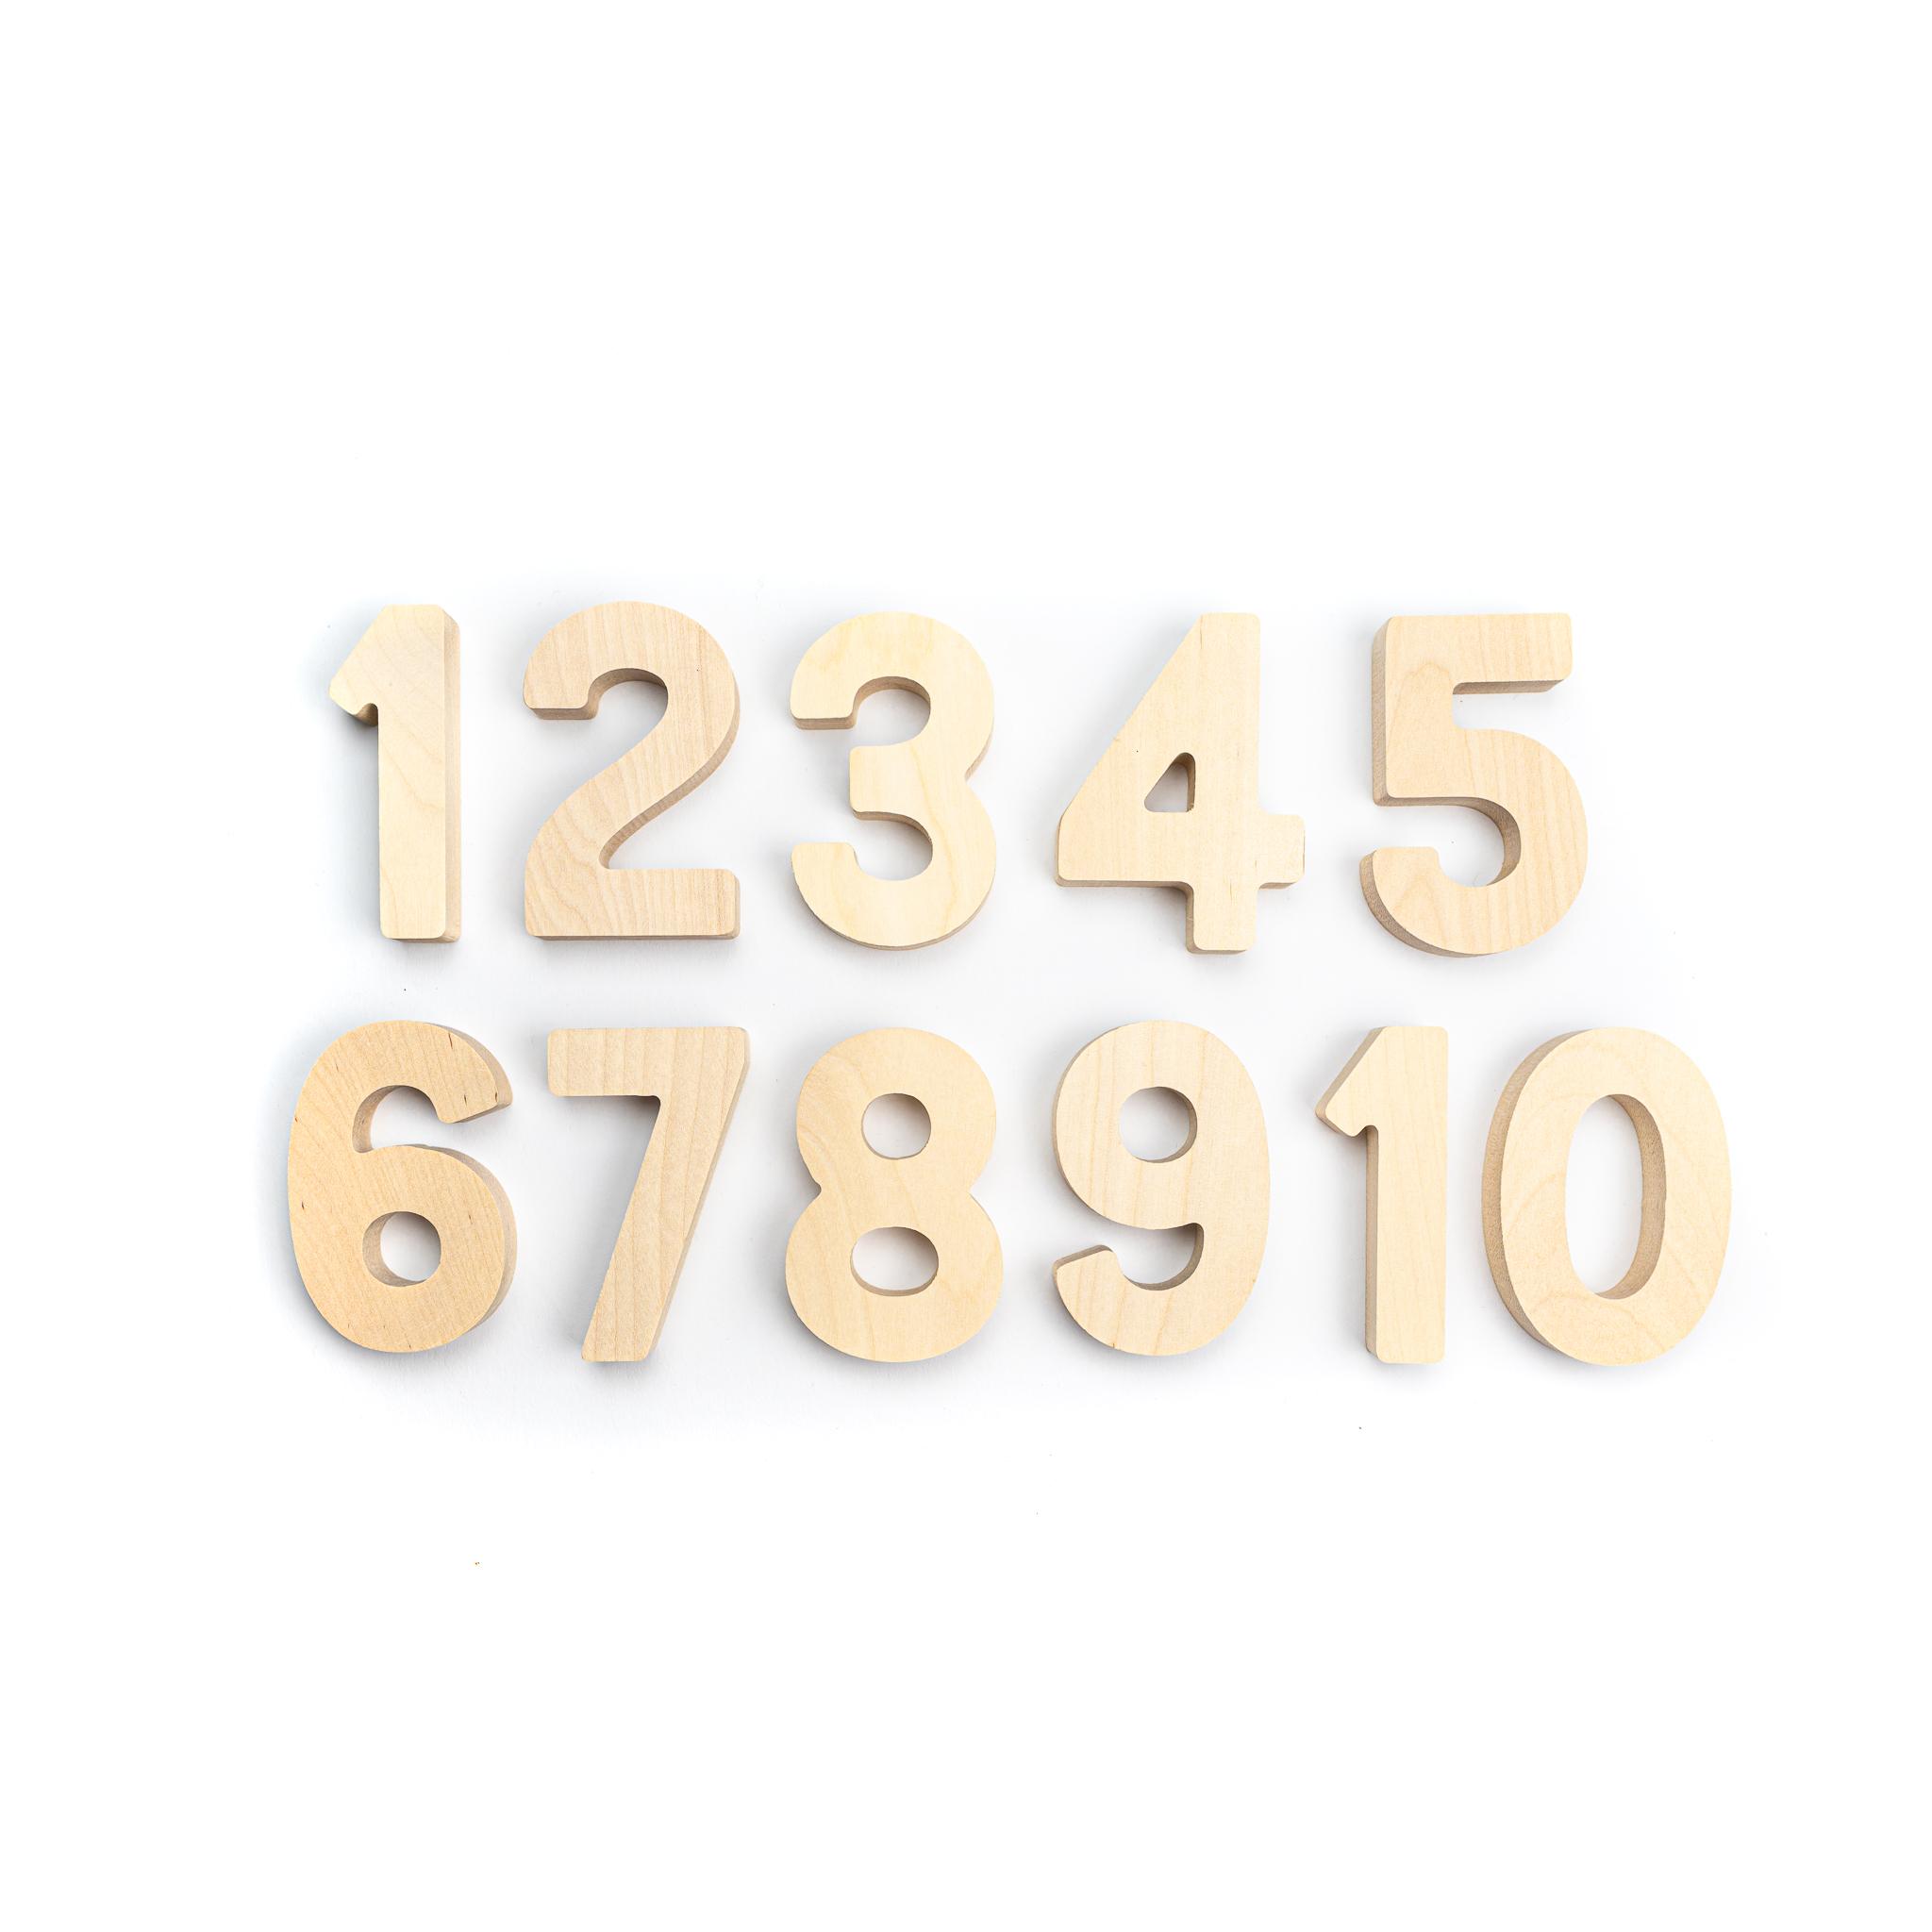 Flockmen_numbers_L.Hercenbergs-2